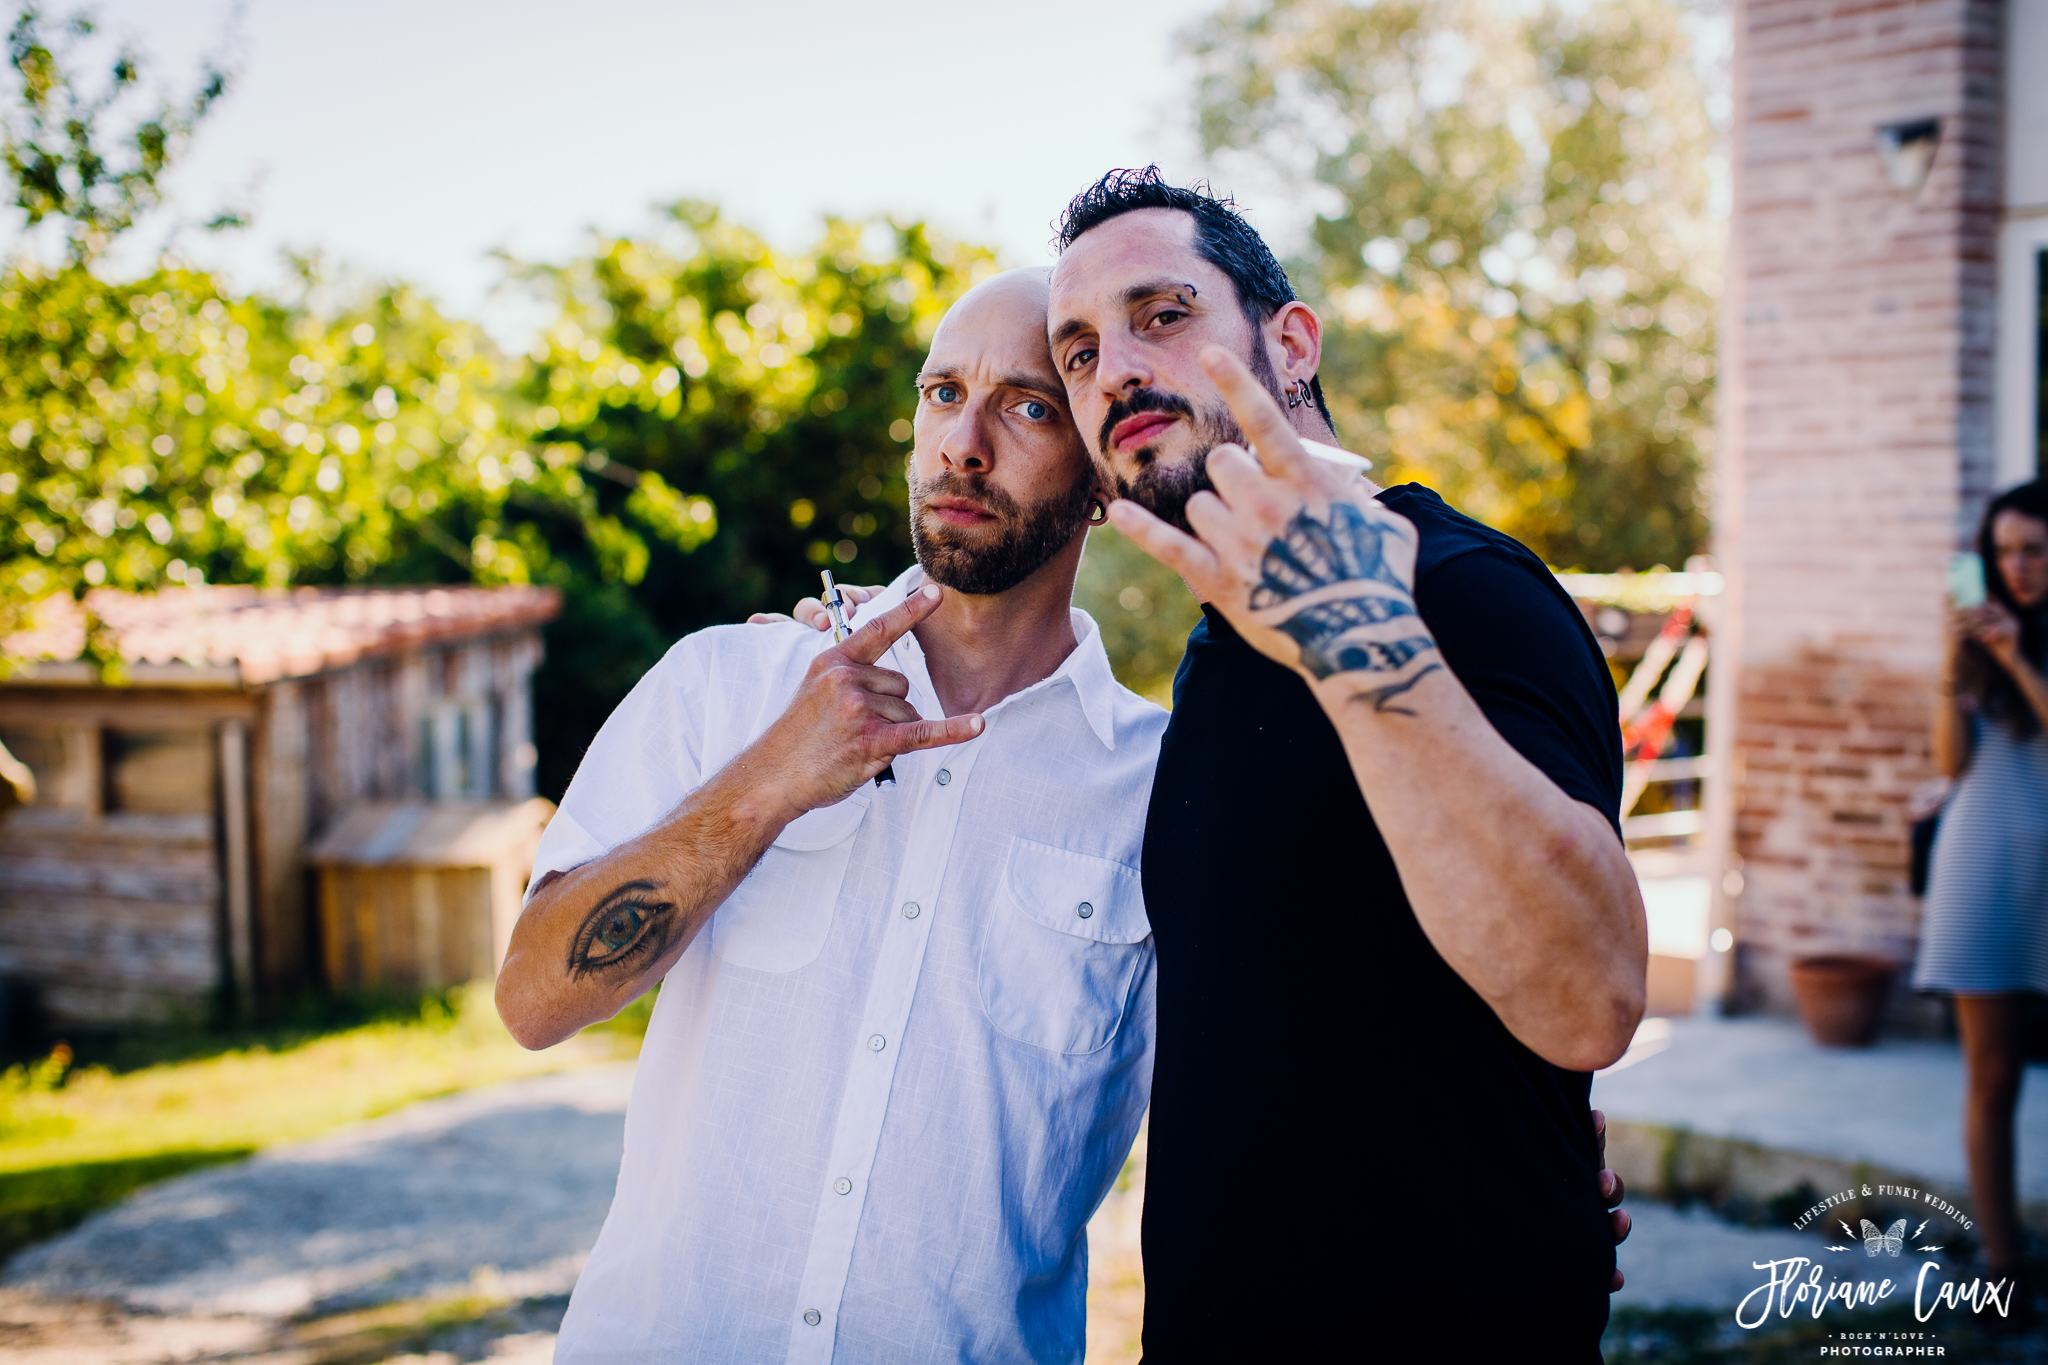 photographe-mariage-toulouse-rocknroll-maries-tatoues-floriane-caux-48